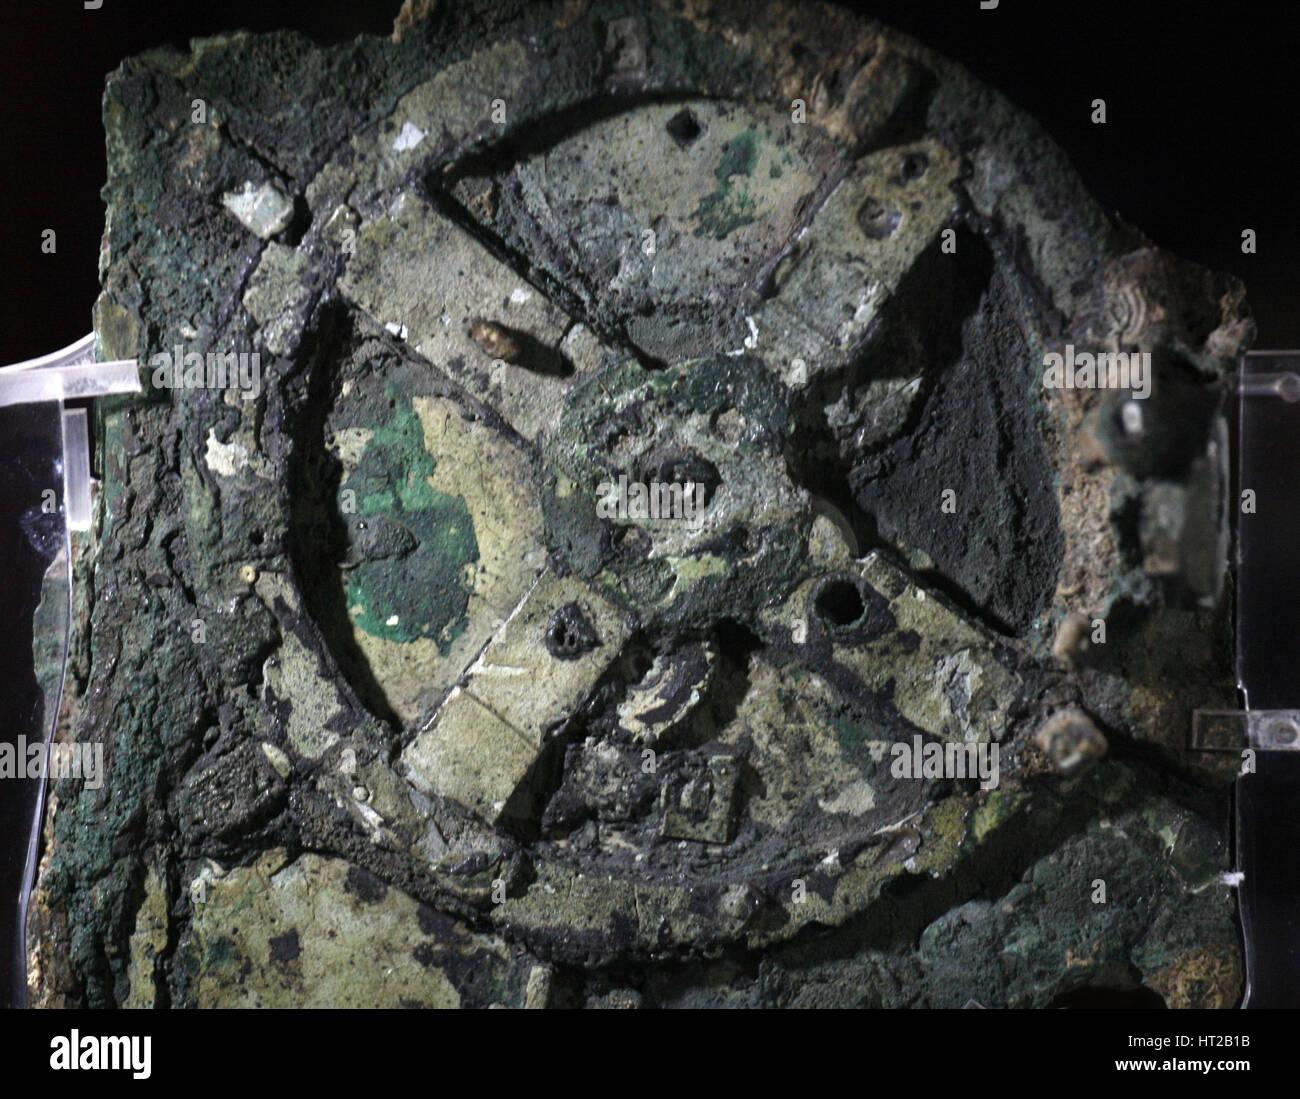 The Antikythera mechanism, 205 BC. Artist: Historic Object - Stock Image